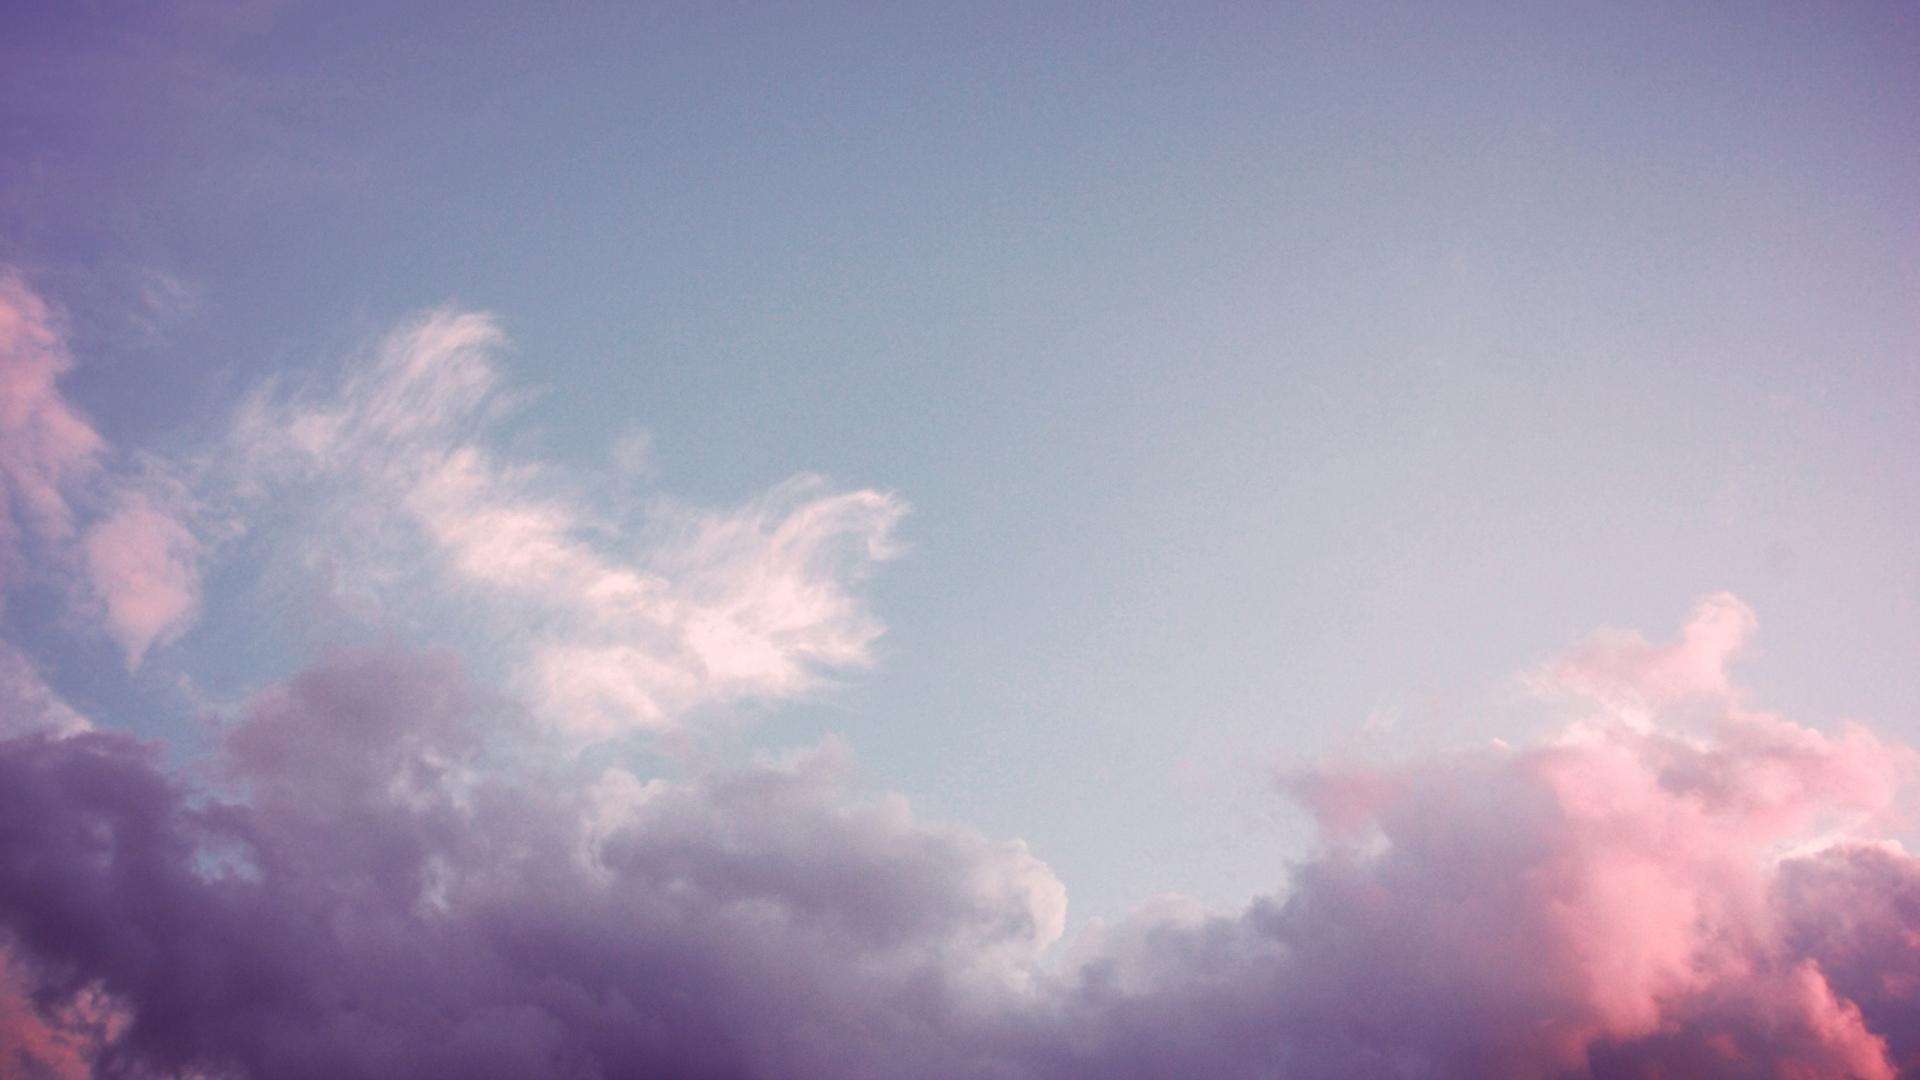 Download sky clouds wallpaper HD wallpaper 1920x1080